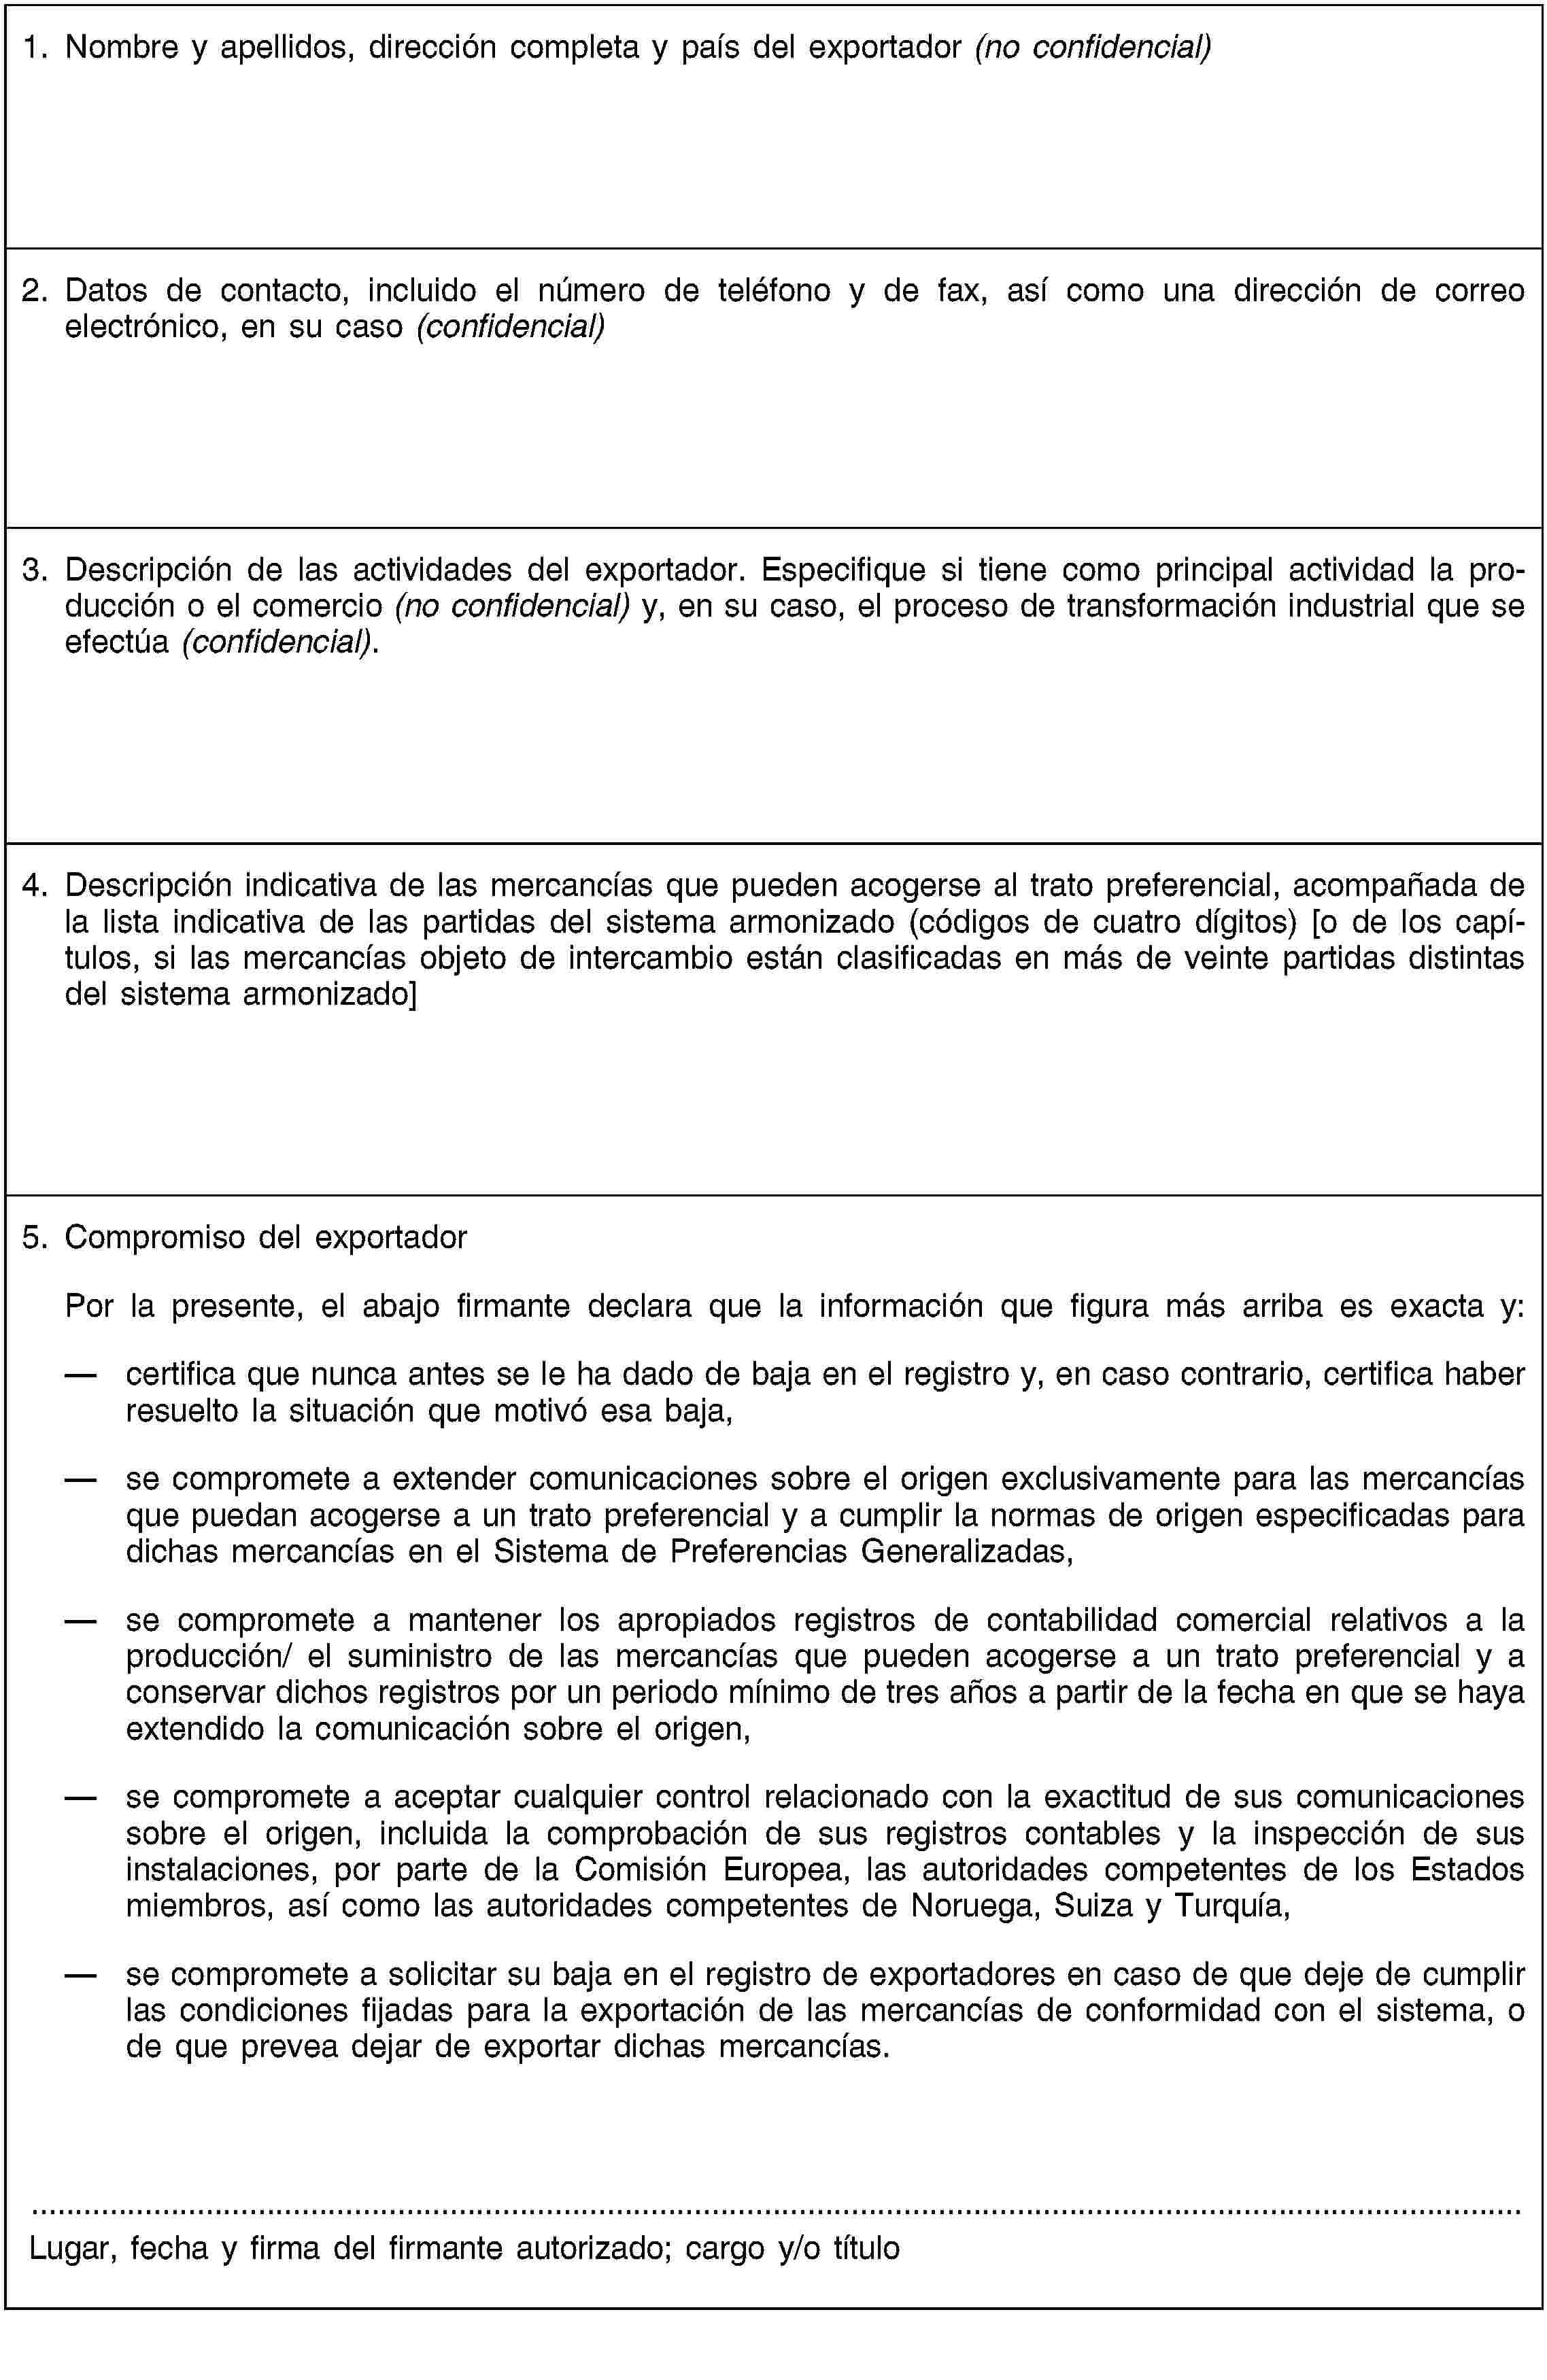 EUR-Lex - 02010R1063-20101130 - EN - EUR-Lex